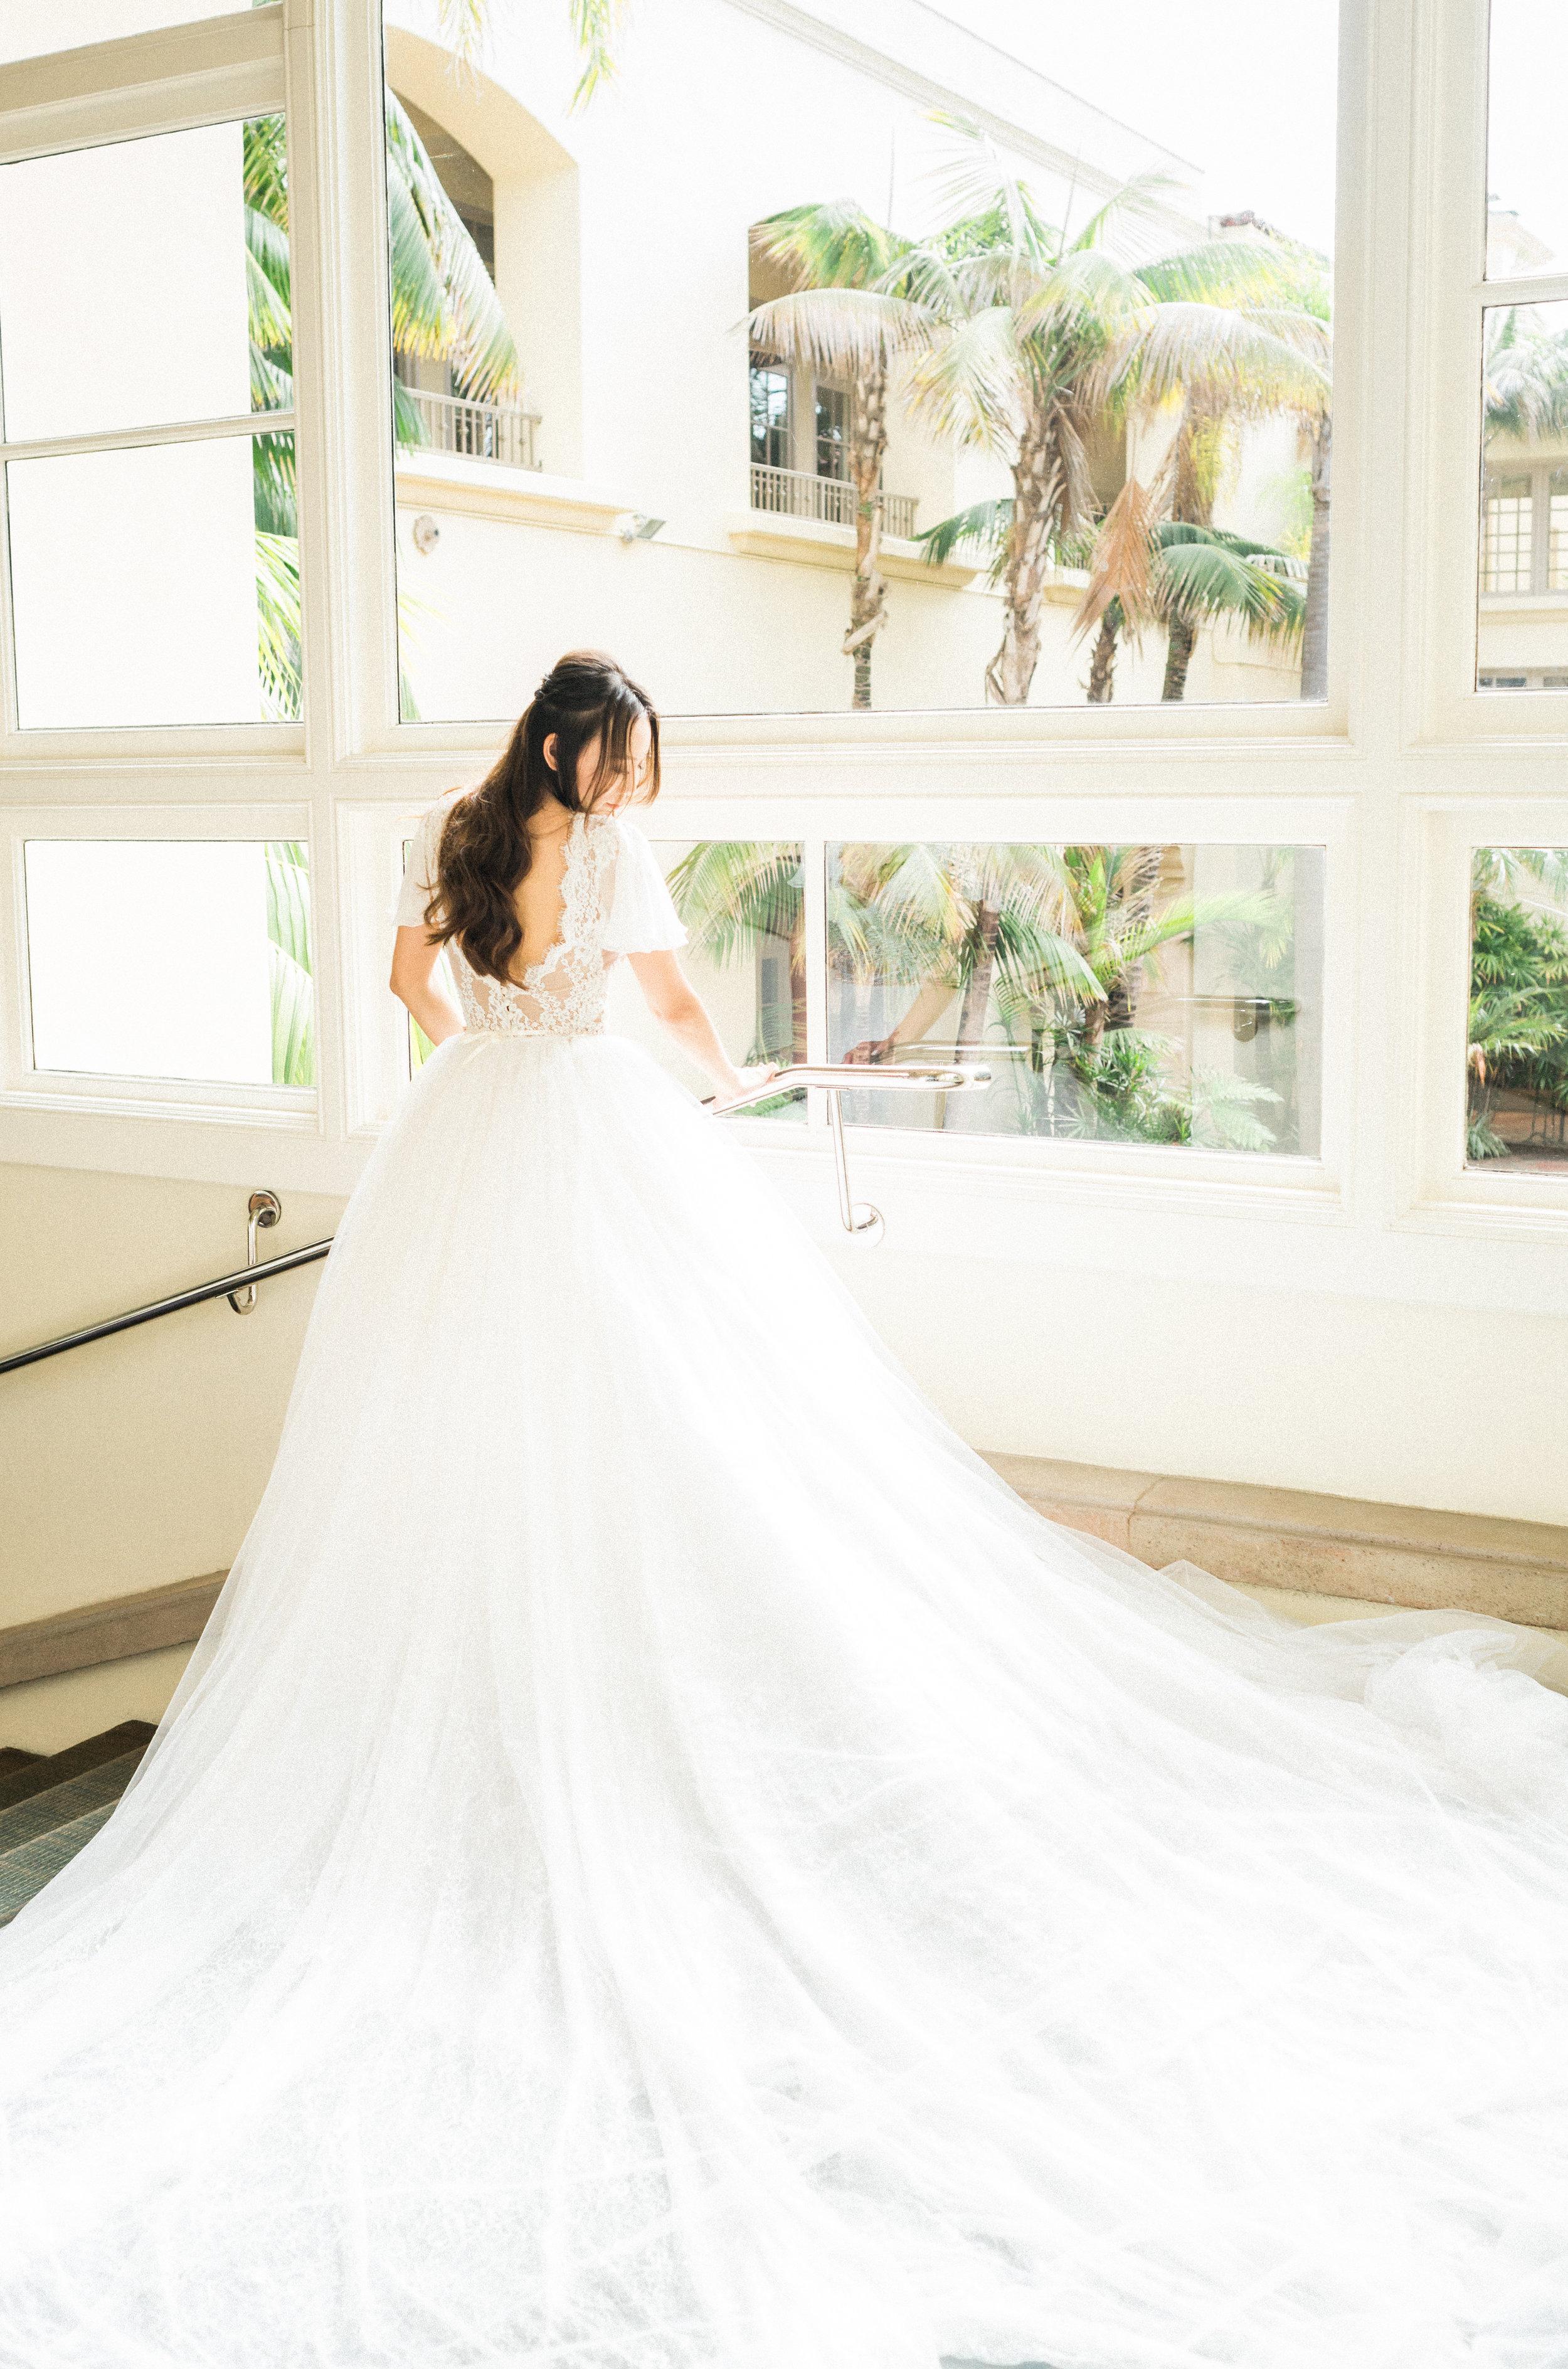 jinza-bridal-detachable-train-low-back-ball-gown.jpg